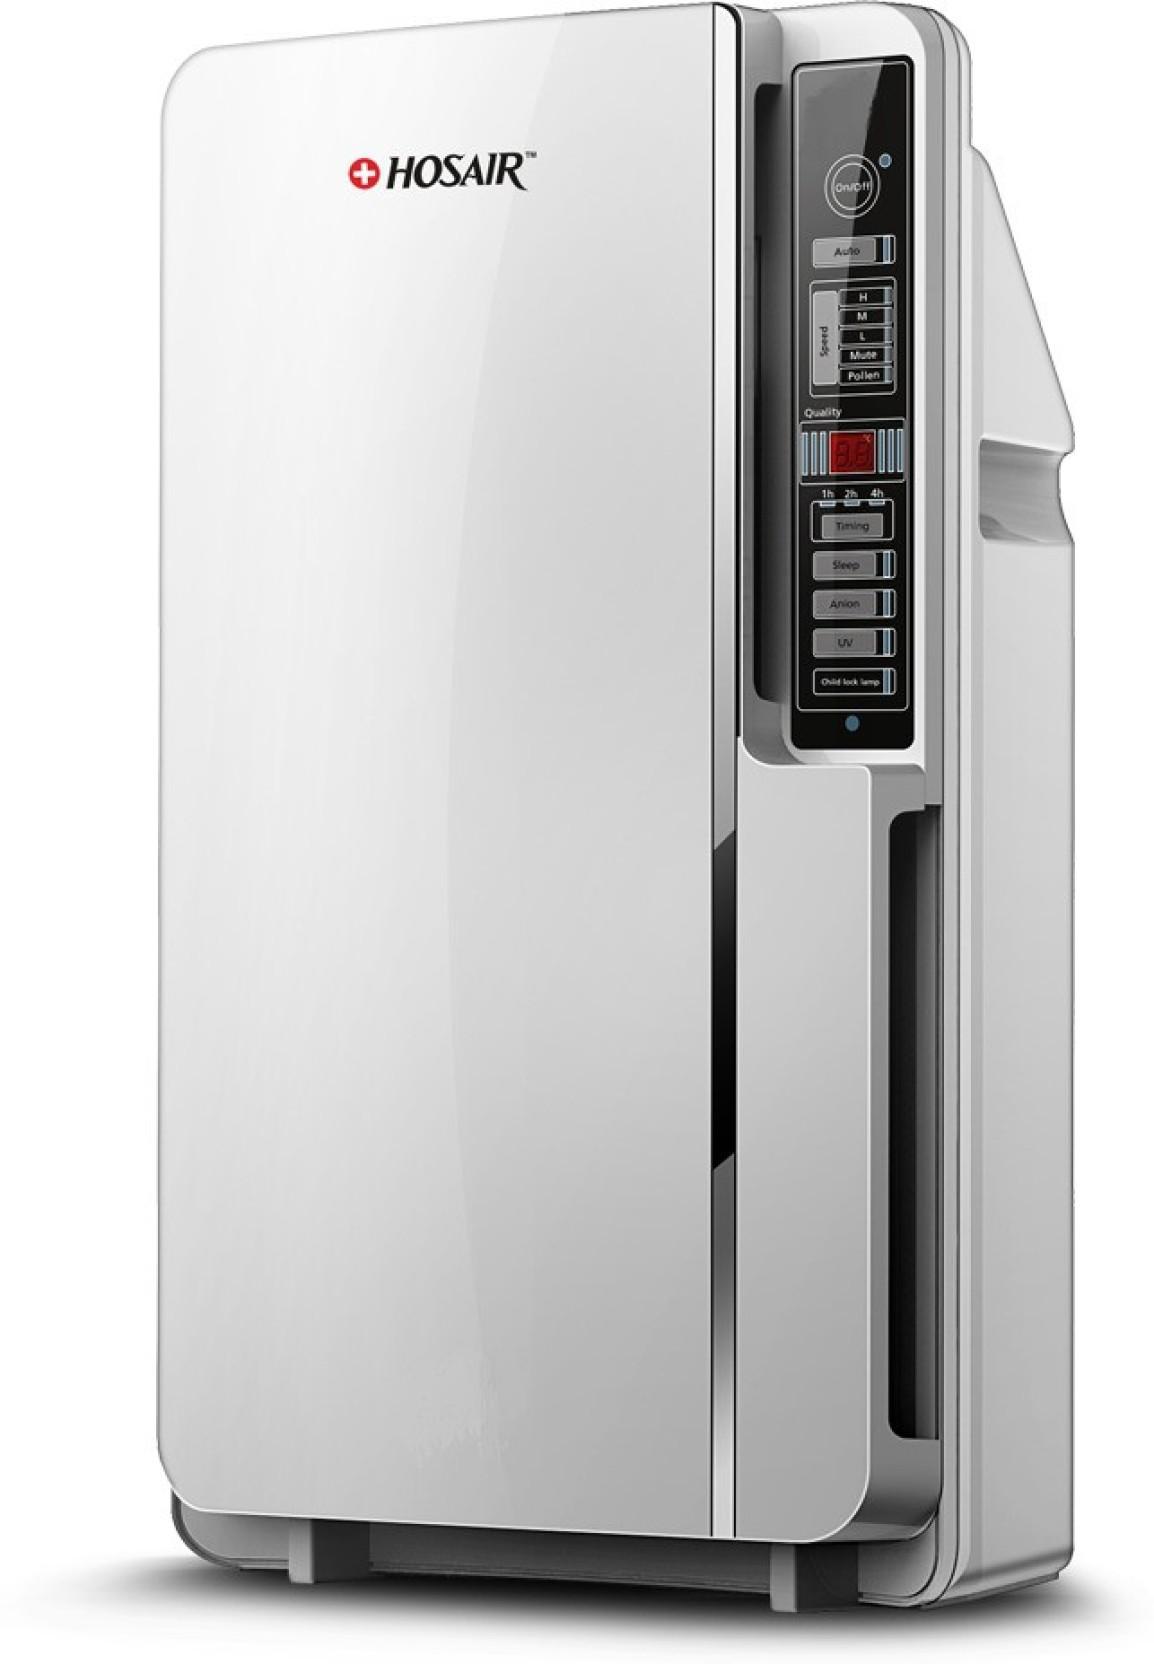 Personal Air Purifier : Hosair airhealth pro portable room air purifier price in